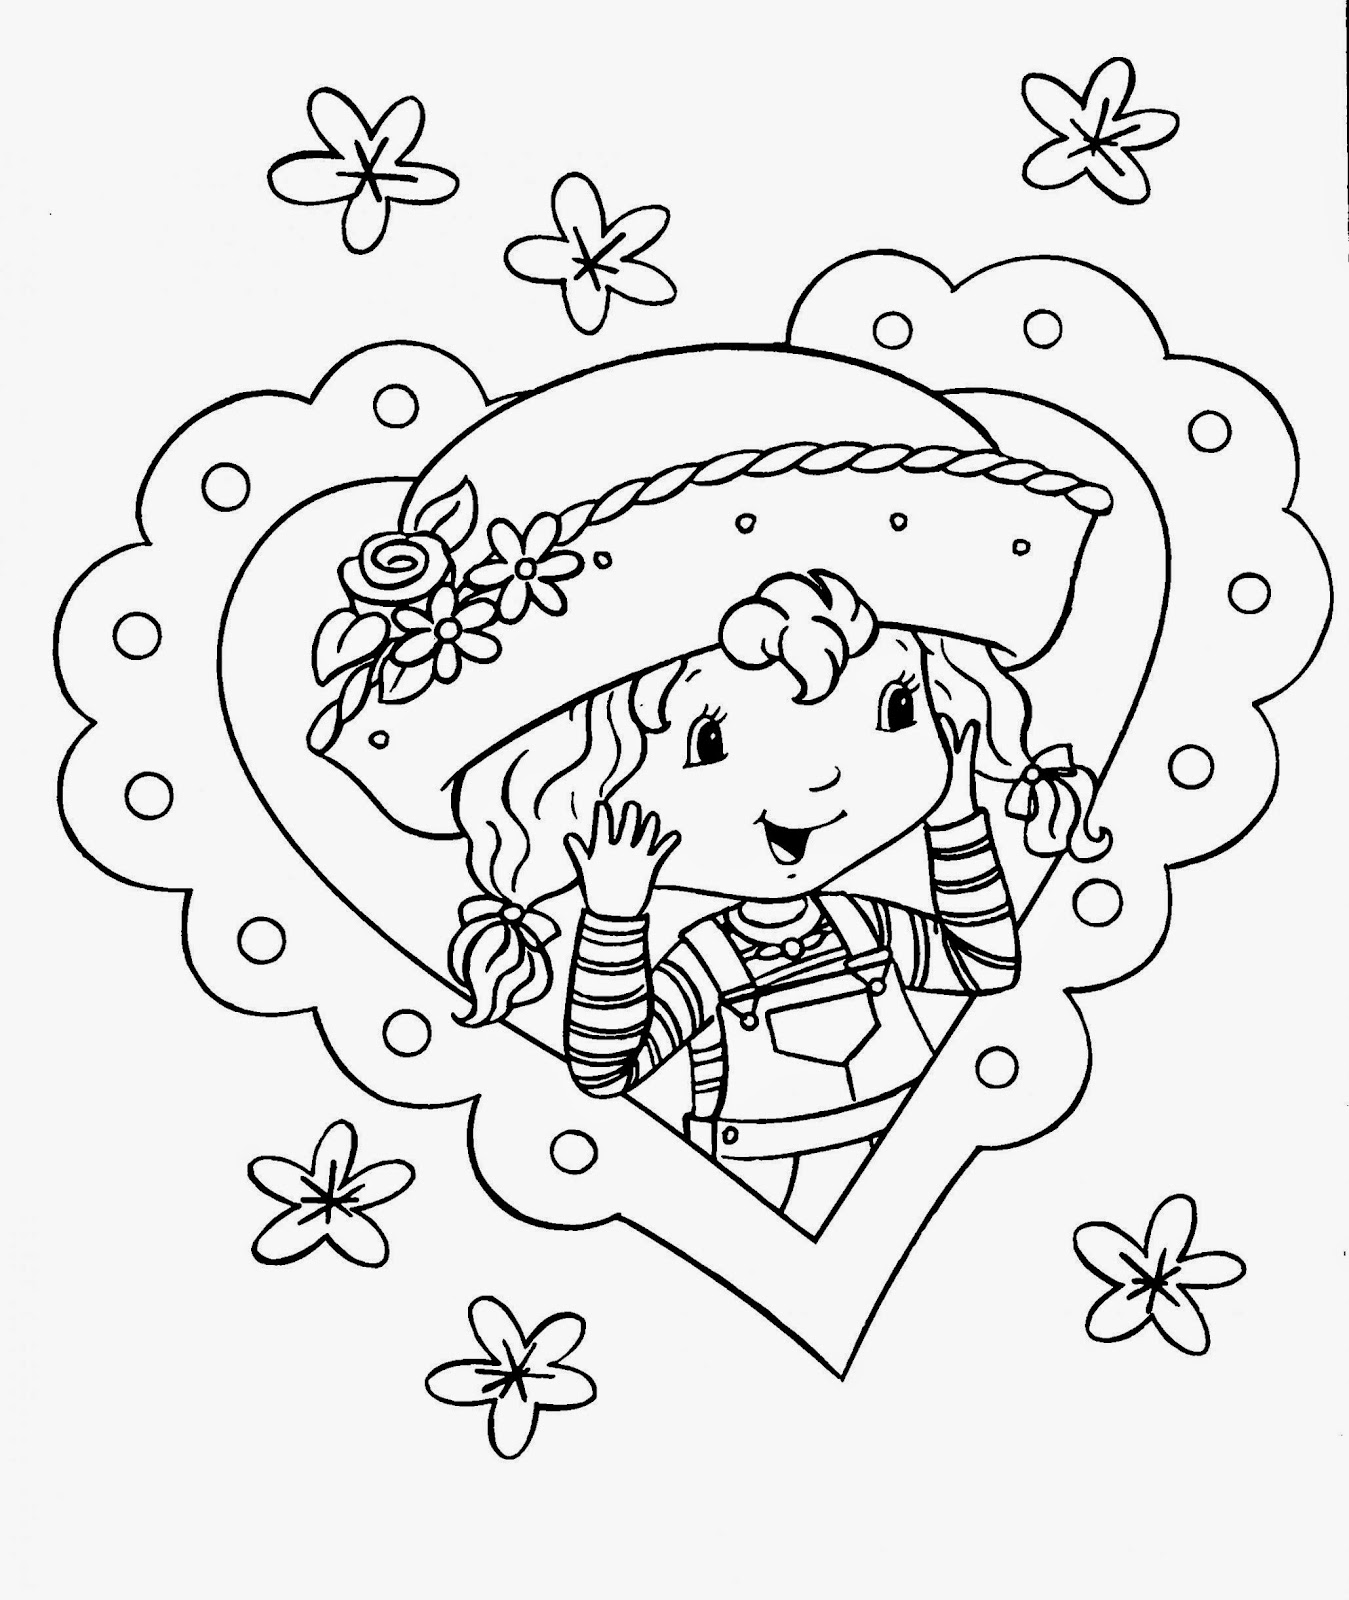 Strawberry shortcake coloring sheets free coloring sheet for Strawberry shortcake coloring pages free printable